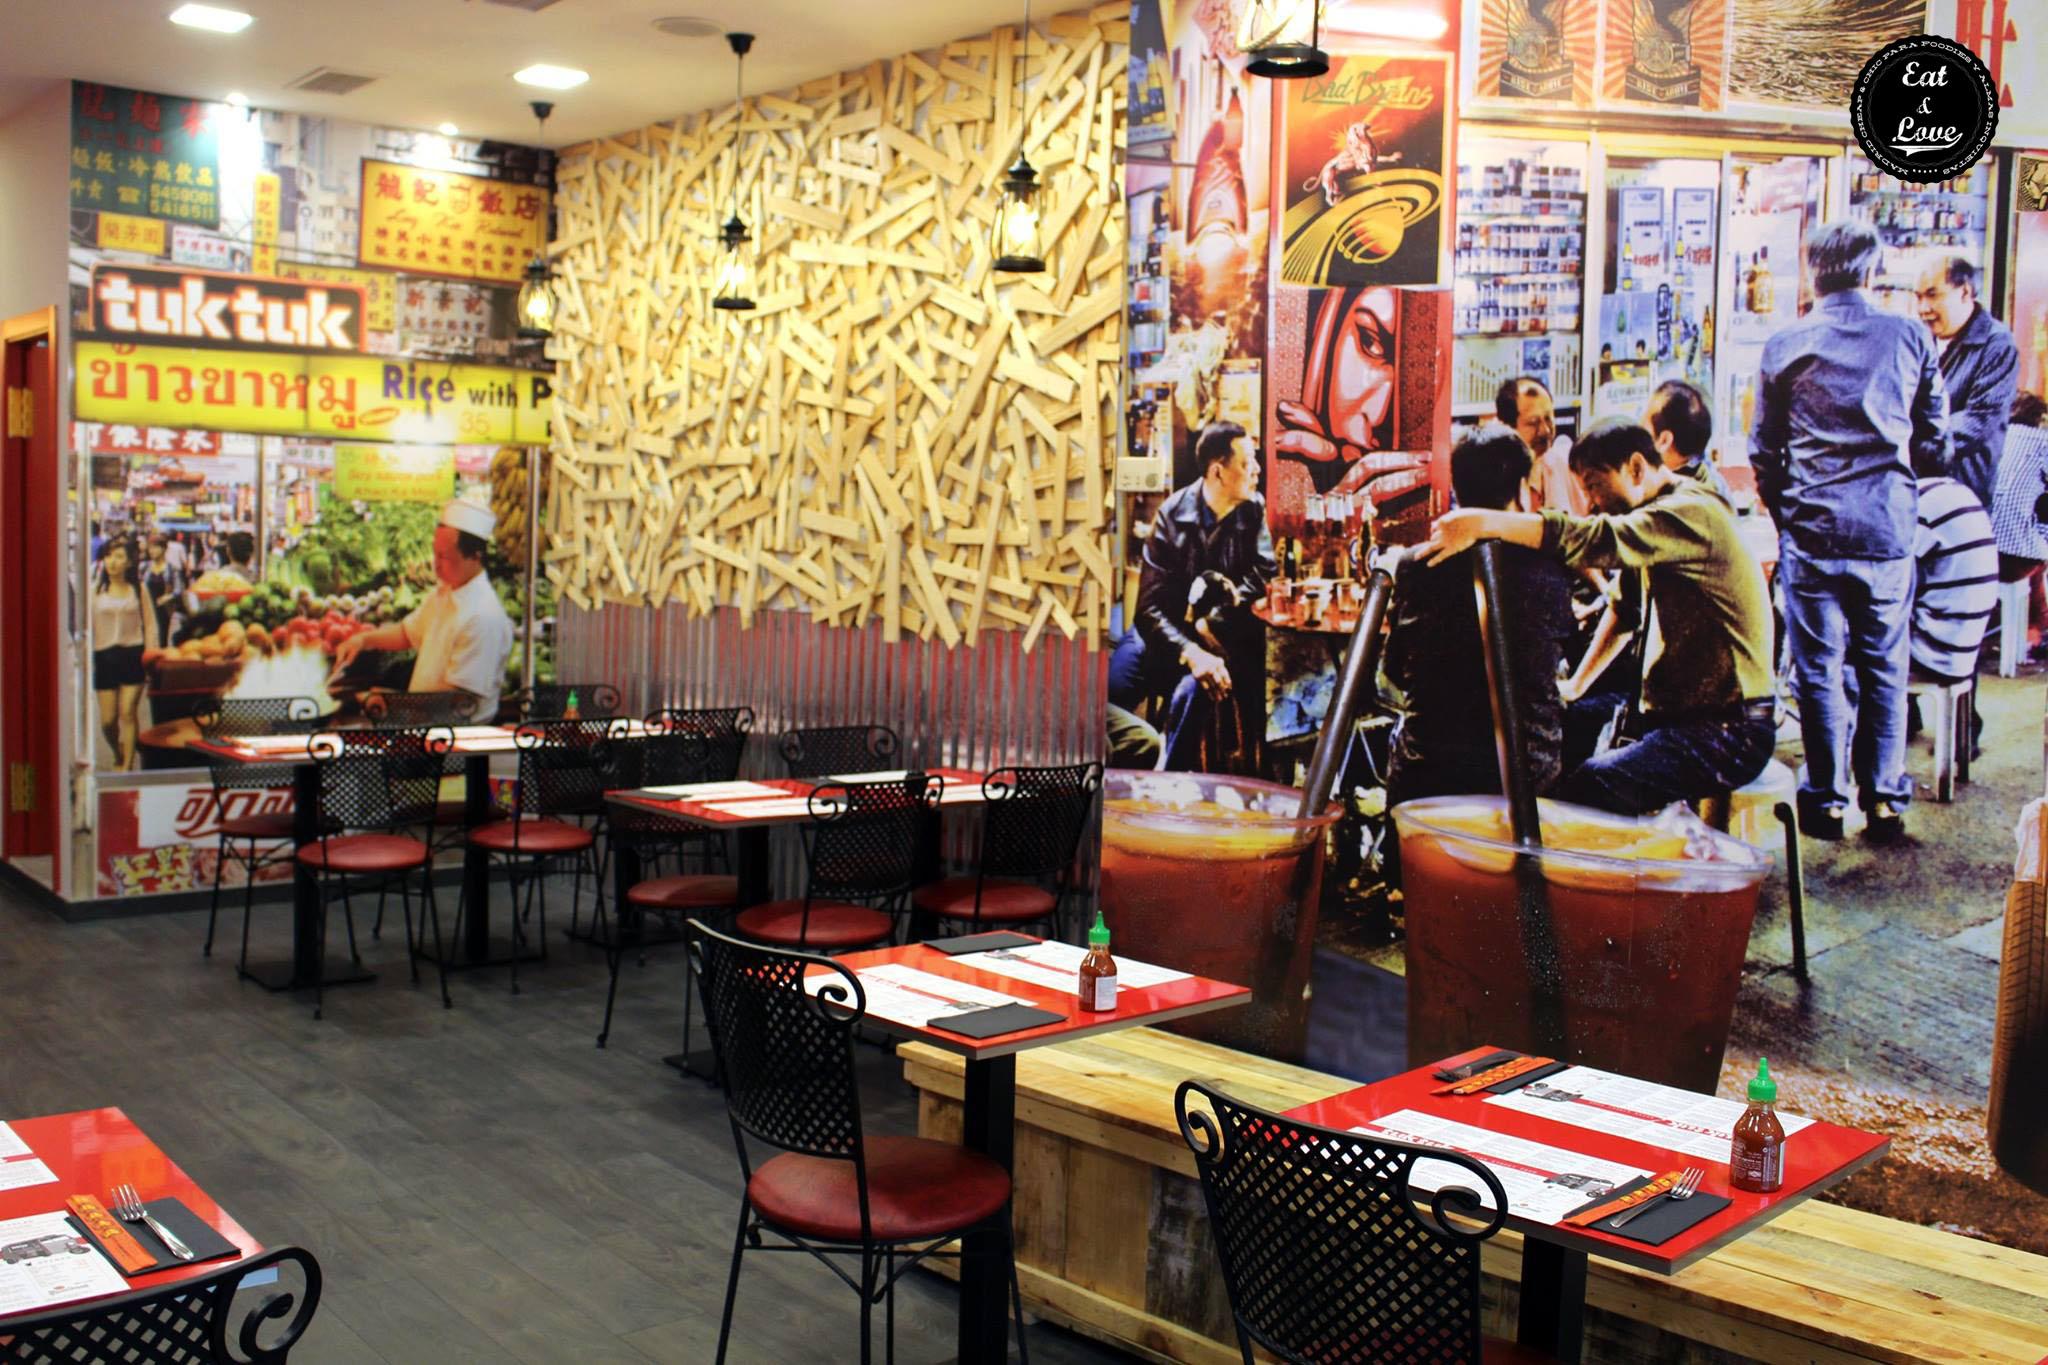 Tuk Tuk General Perón restaurante asiático Madrid